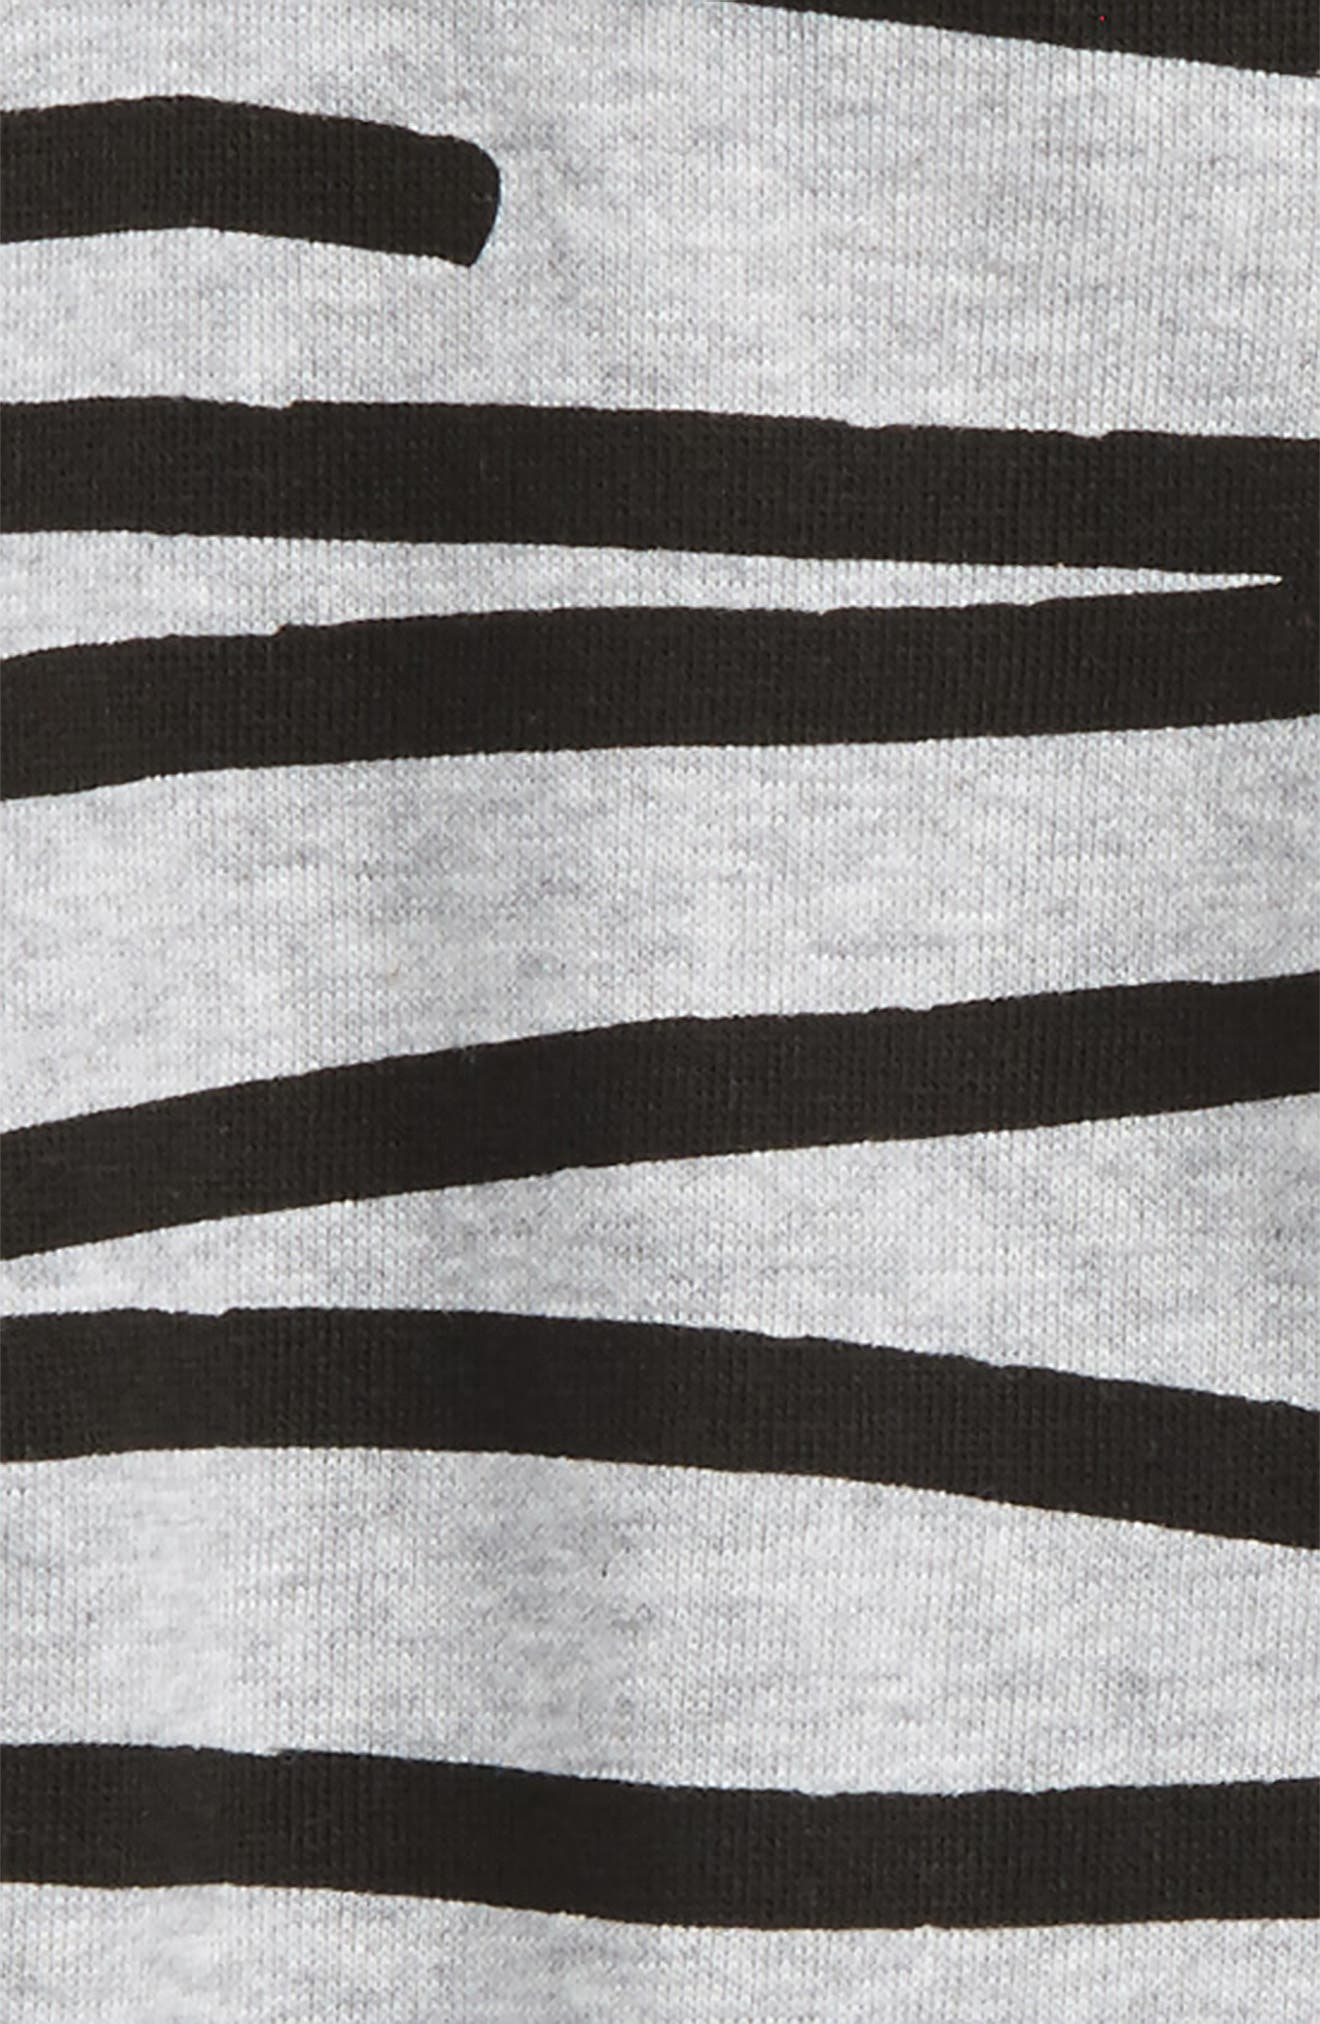 Stripe Romper,                             Alternate thumbnail 2, color,                             Grey Marle/ Black